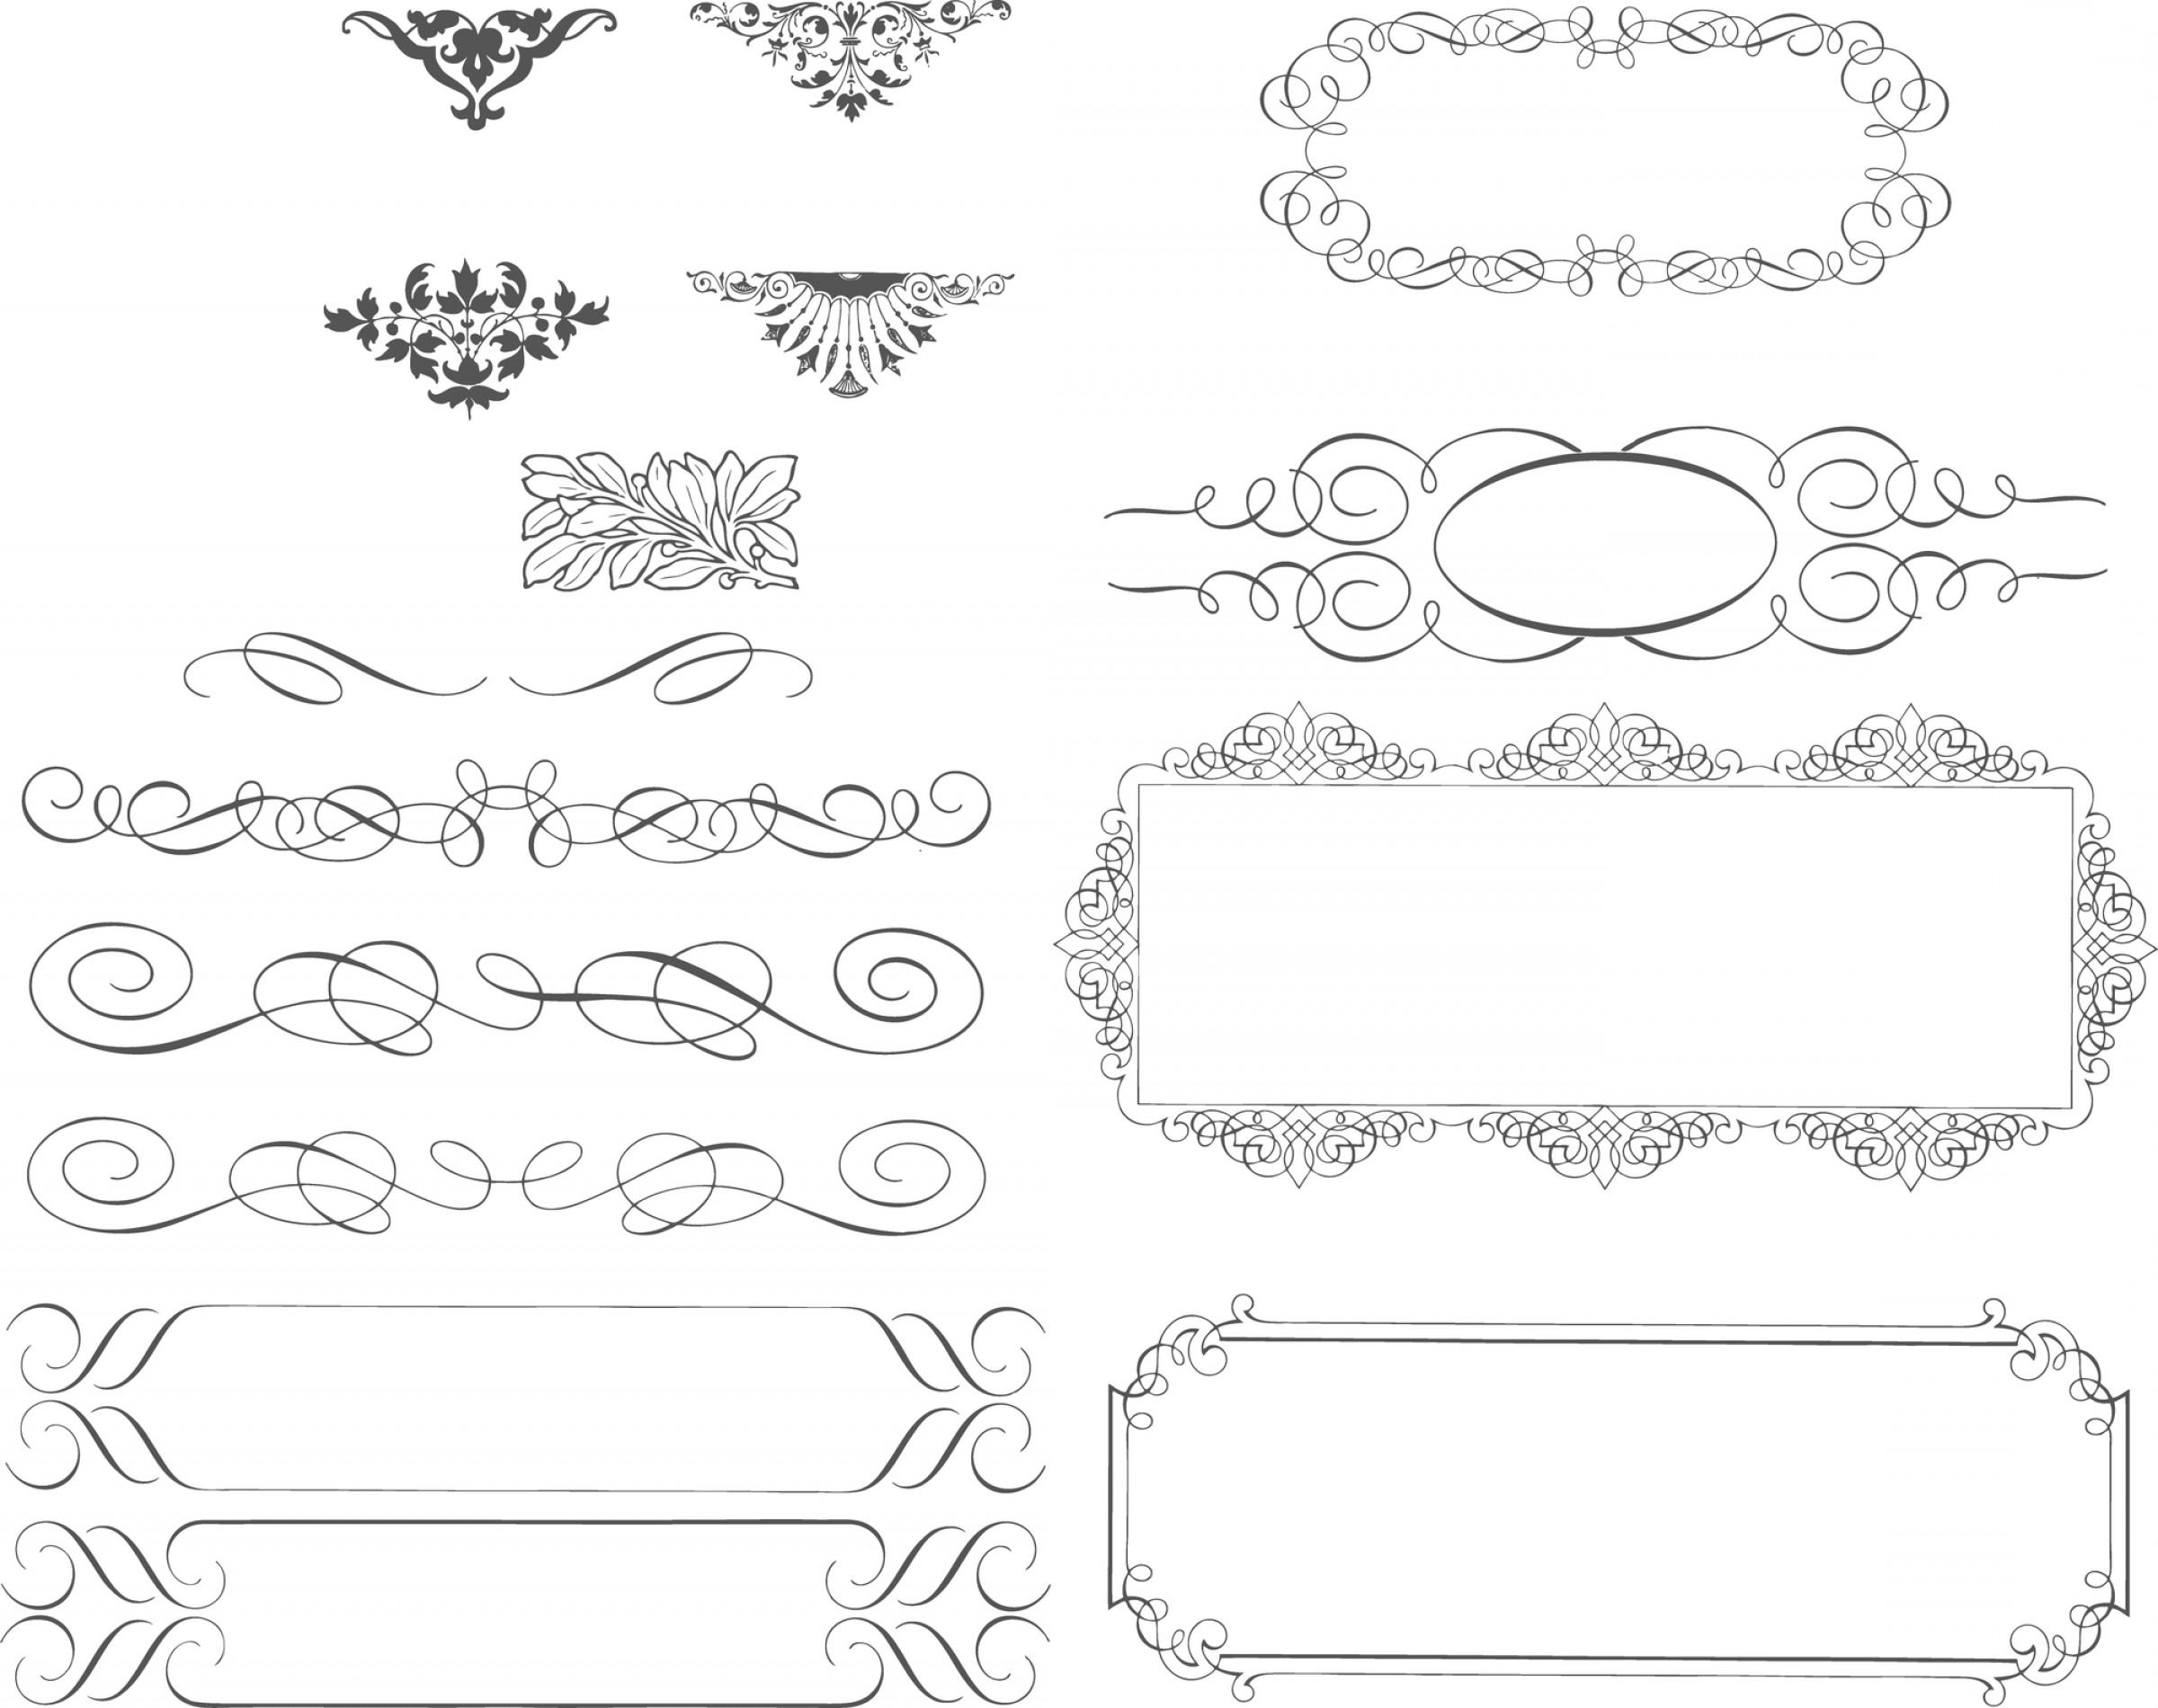 2400x1900 Succinct Lace Trimming Vector Source Material Succinct Shopatcloth